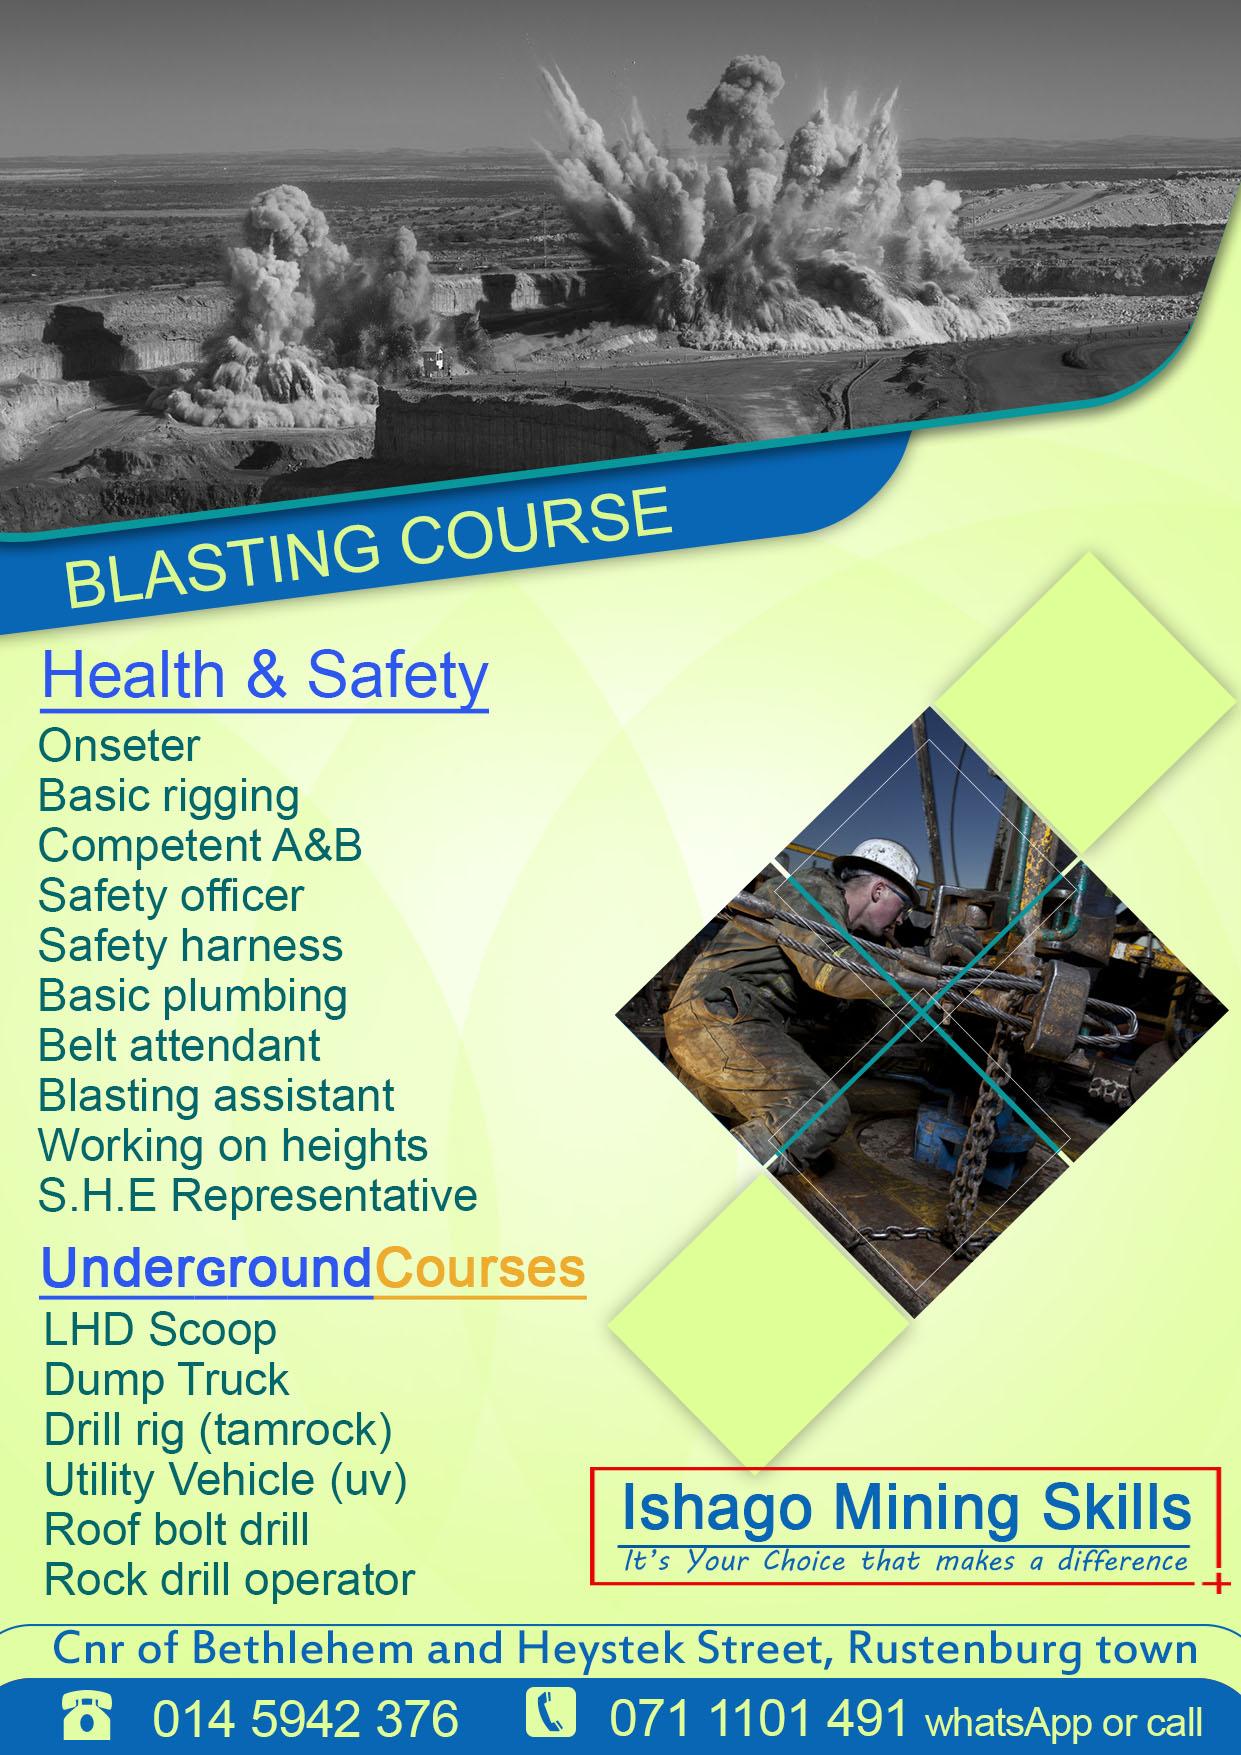 Blasting assistant training center in rustenburg/klerksdorp